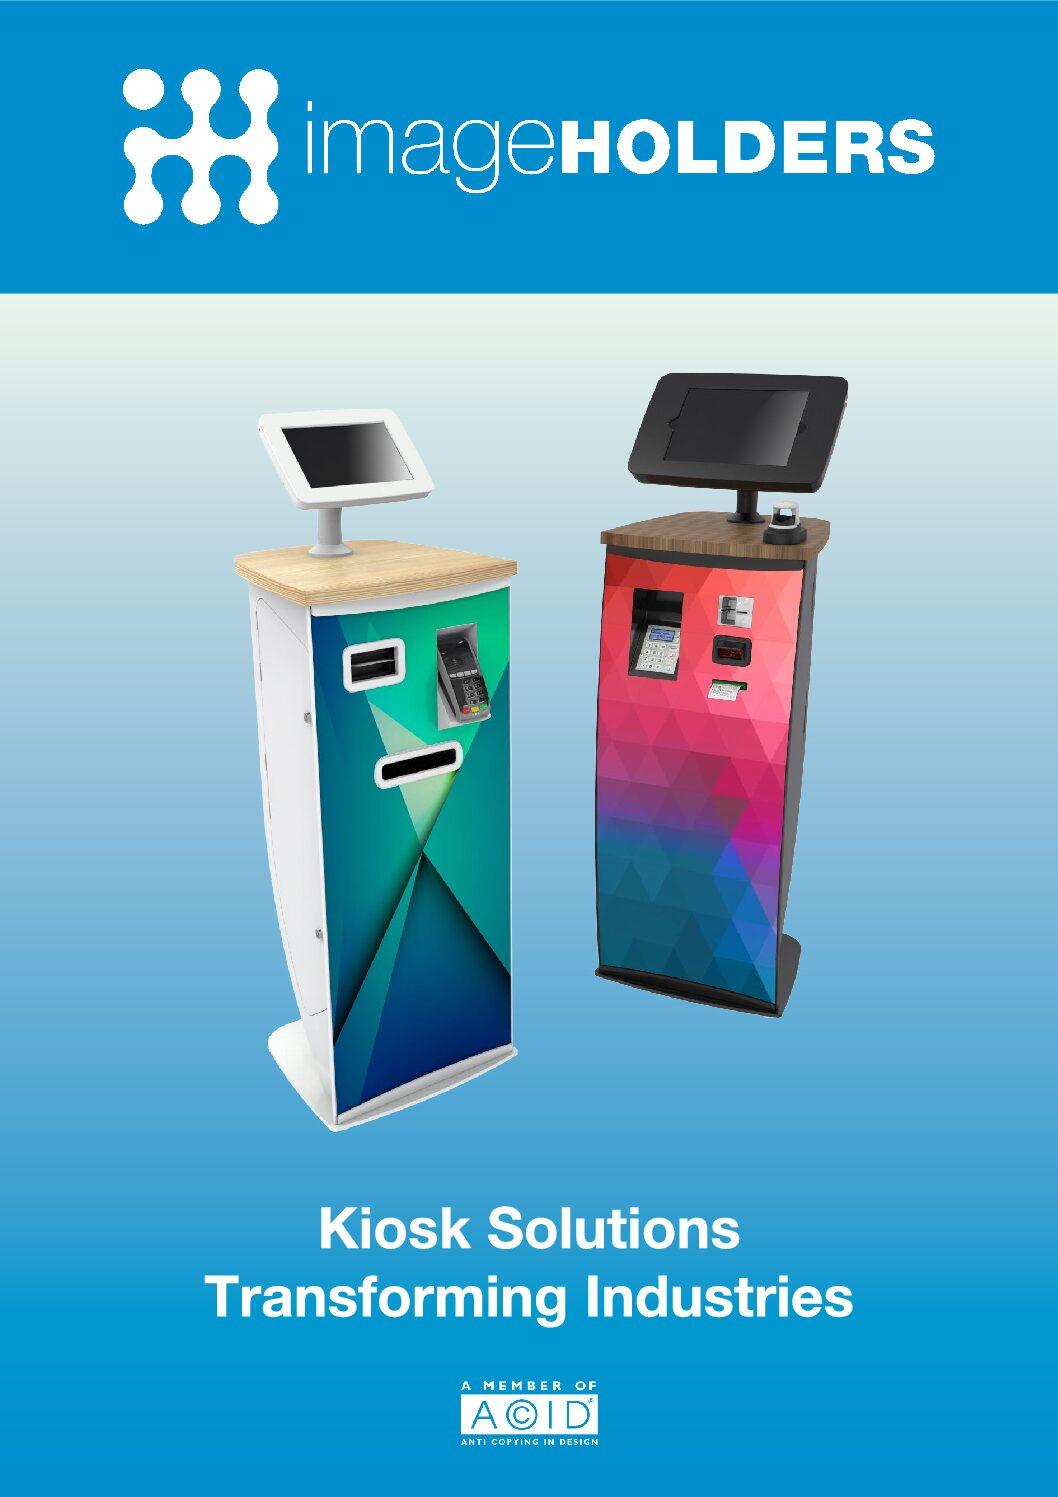 Kiosk Solutions – Transforming Industries